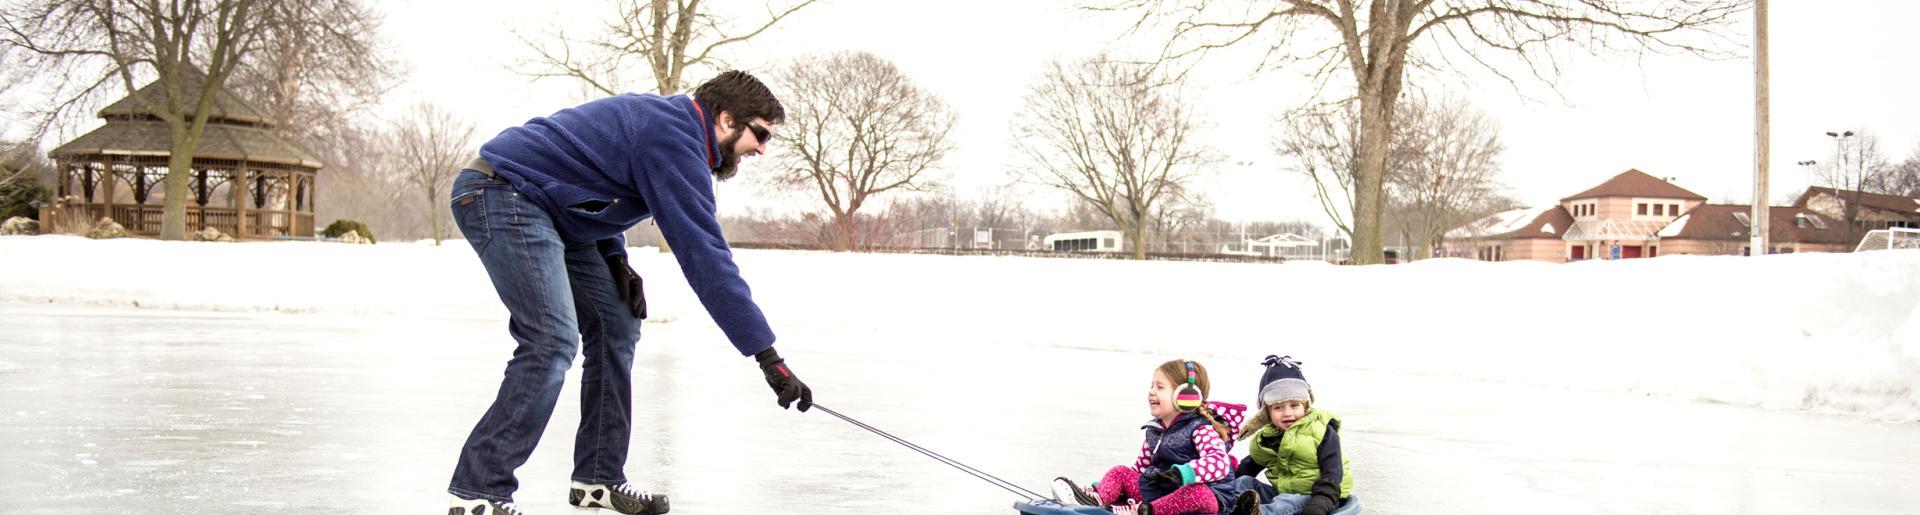 Sledding & Skating on Ice in Madison